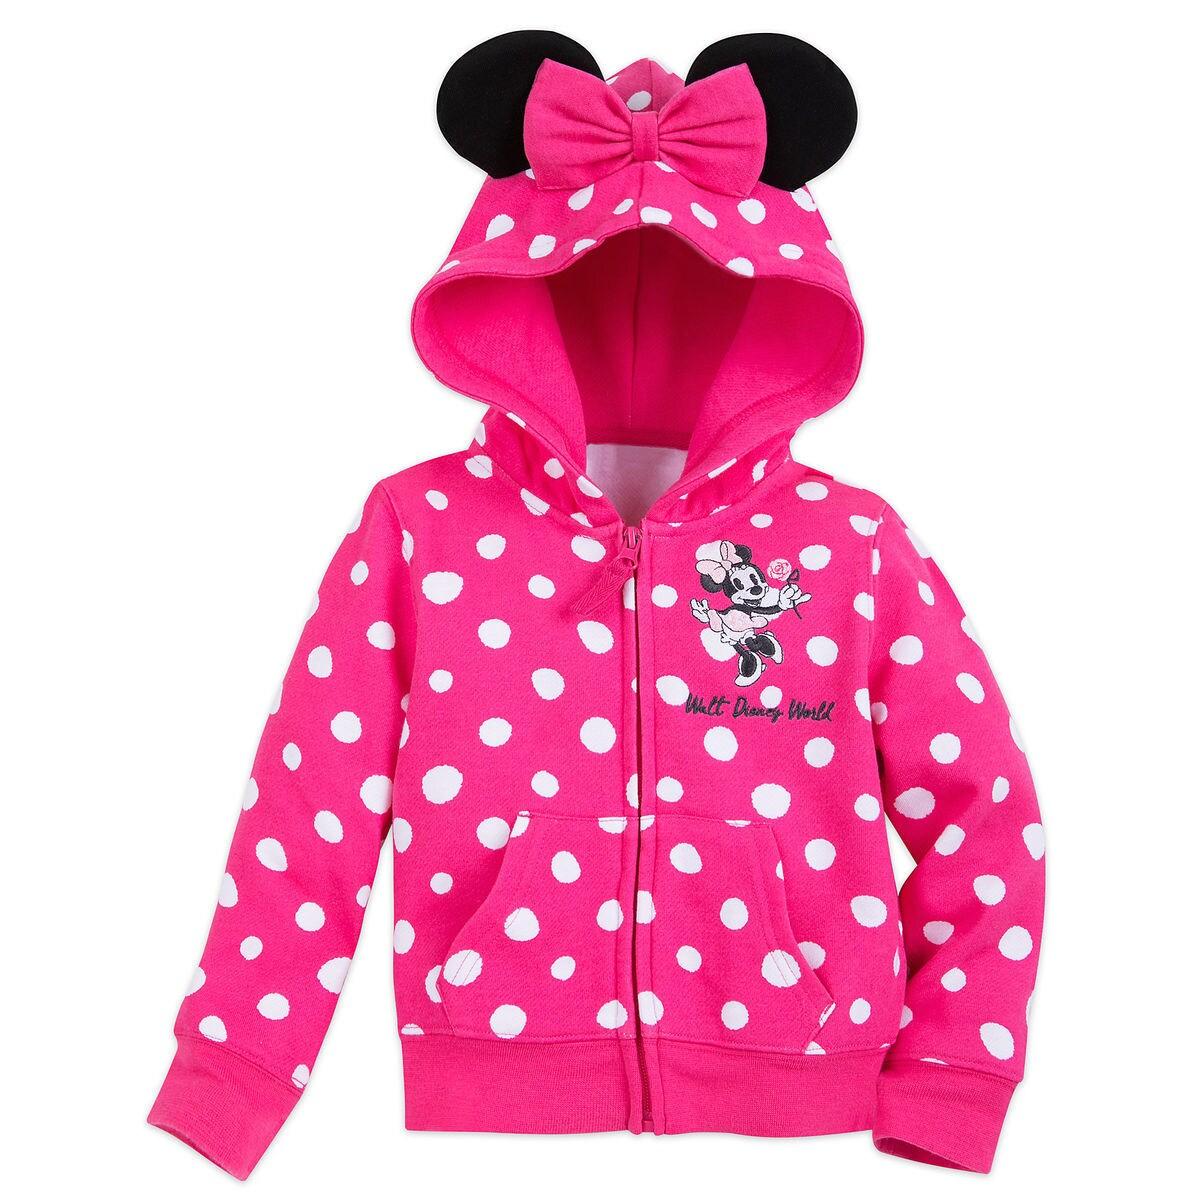 e9bcd3e71a91 Sweet Minnie Mouse Ears Hoodie for Girls - Walt Disney World ...